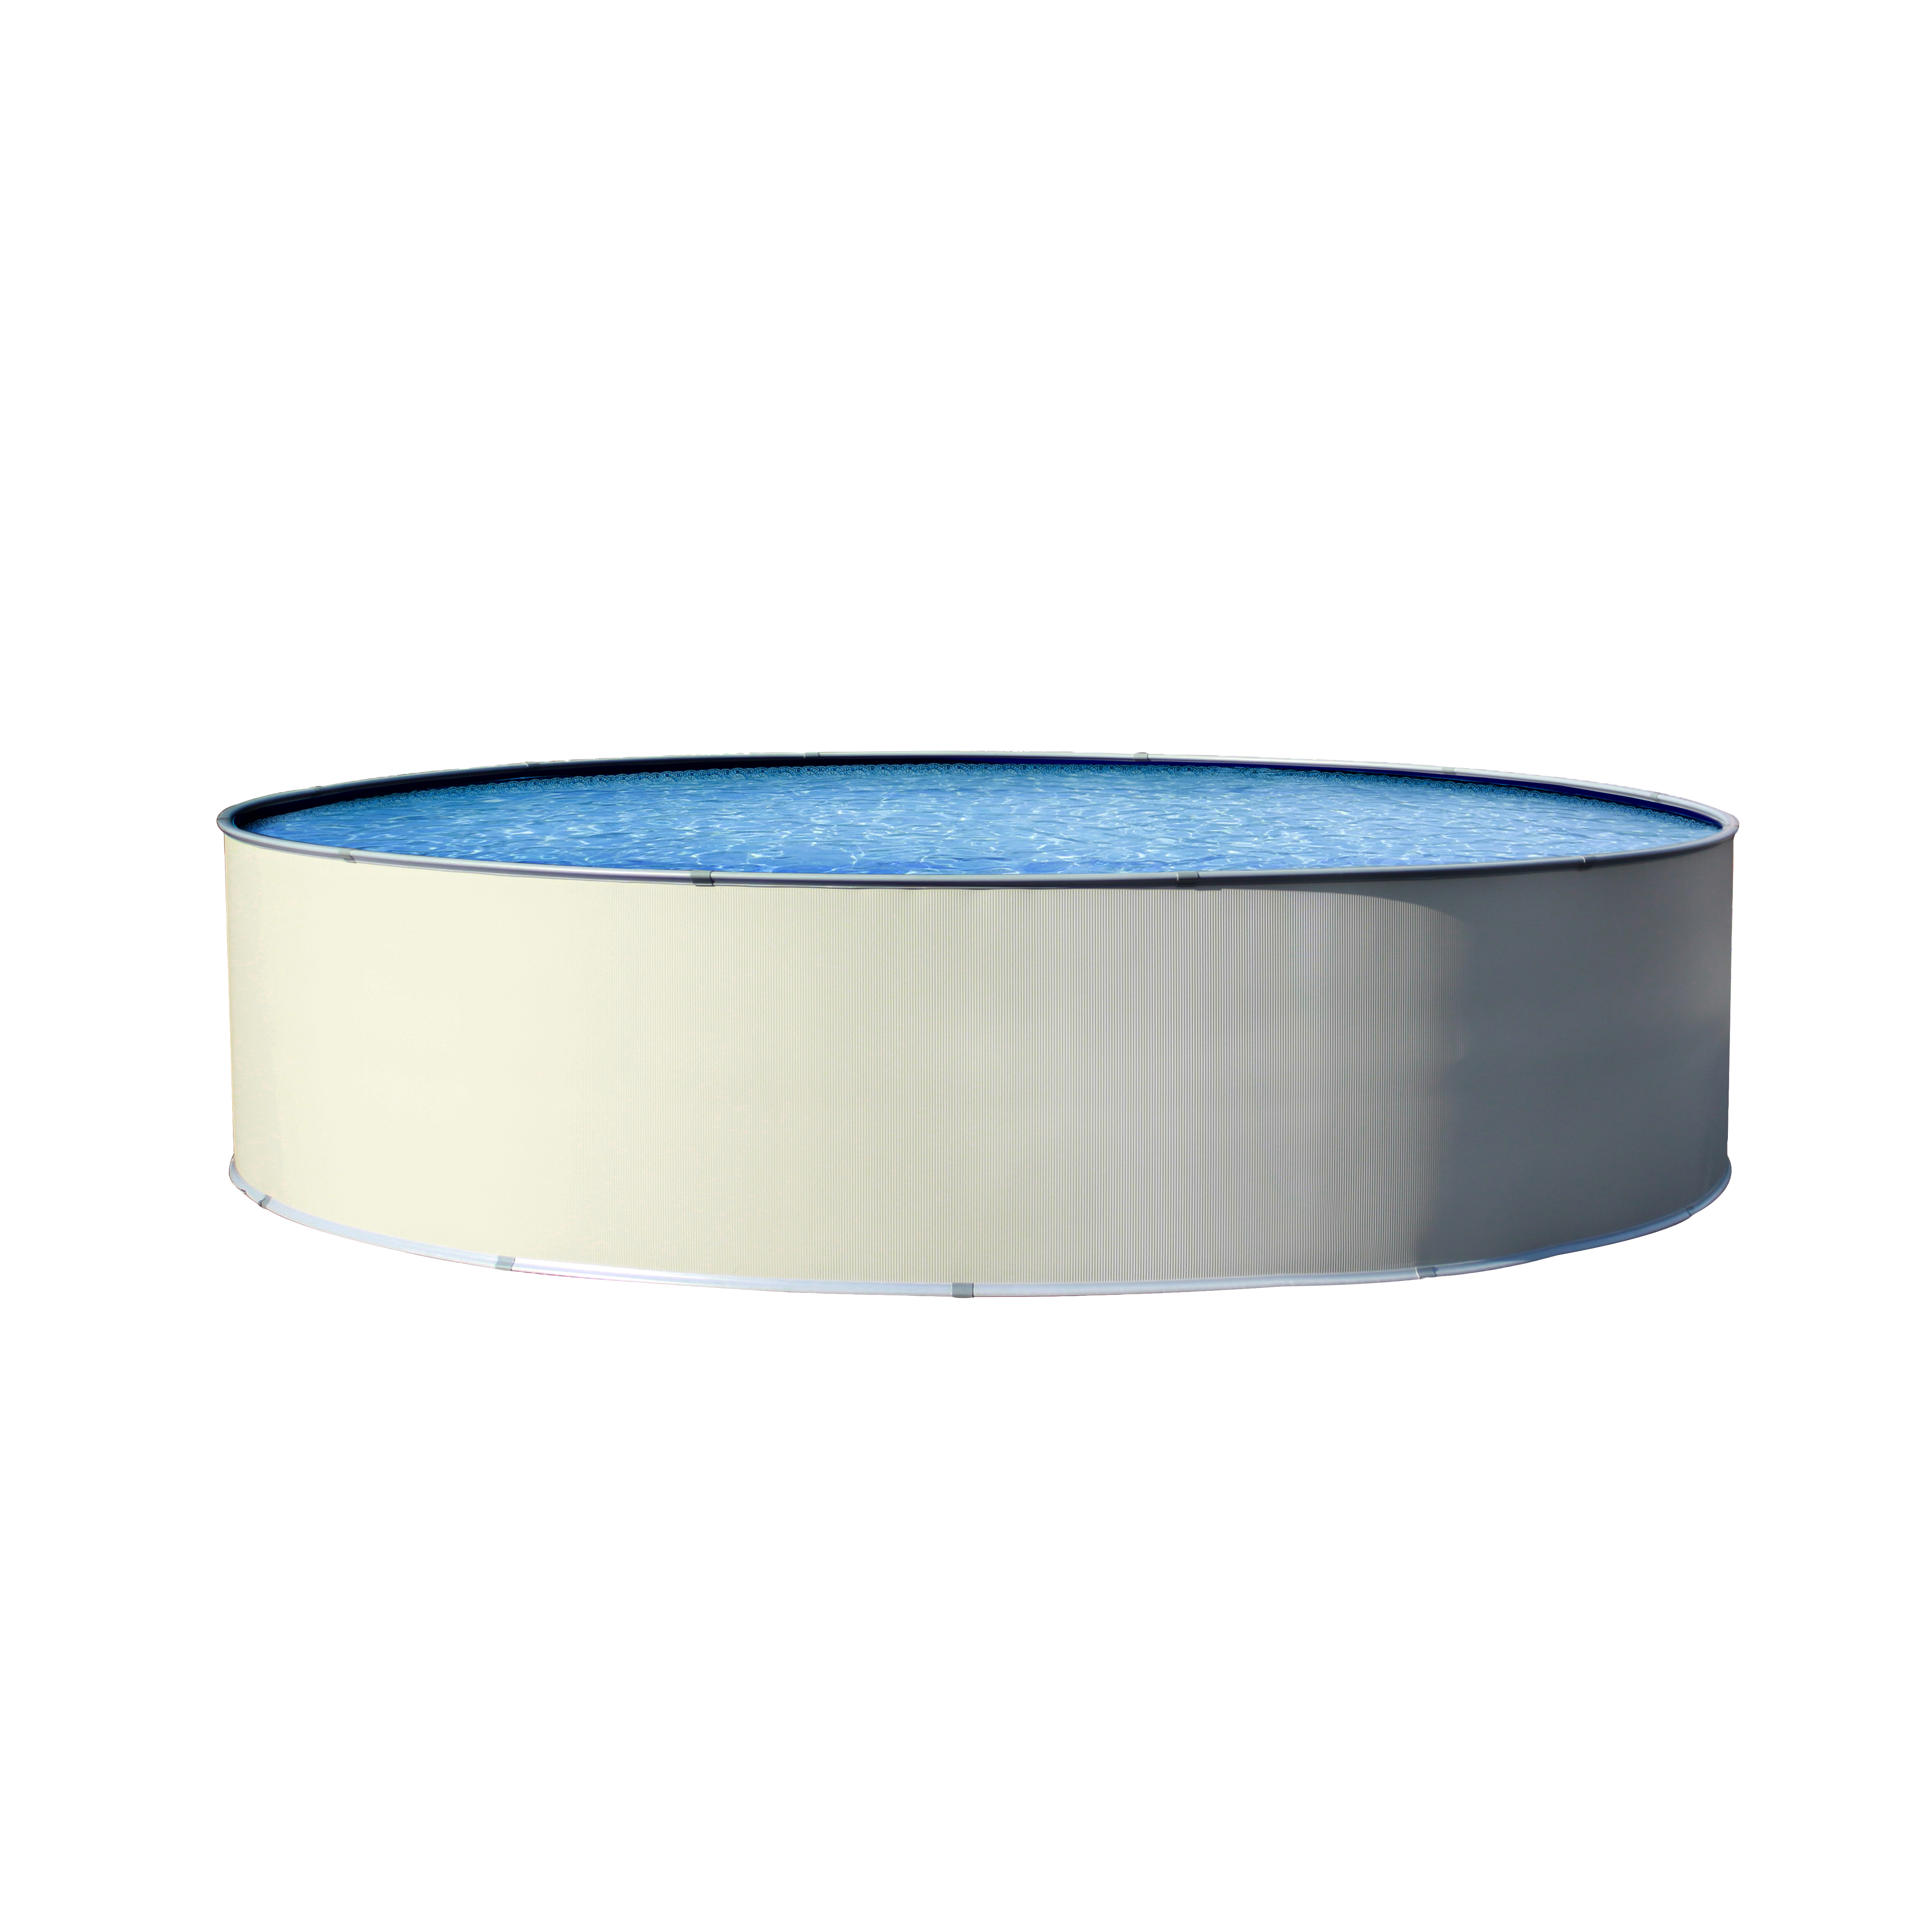 Simplicity 15 pied ronde piscine hors terre forfait for Cloture piscine hors terre prix